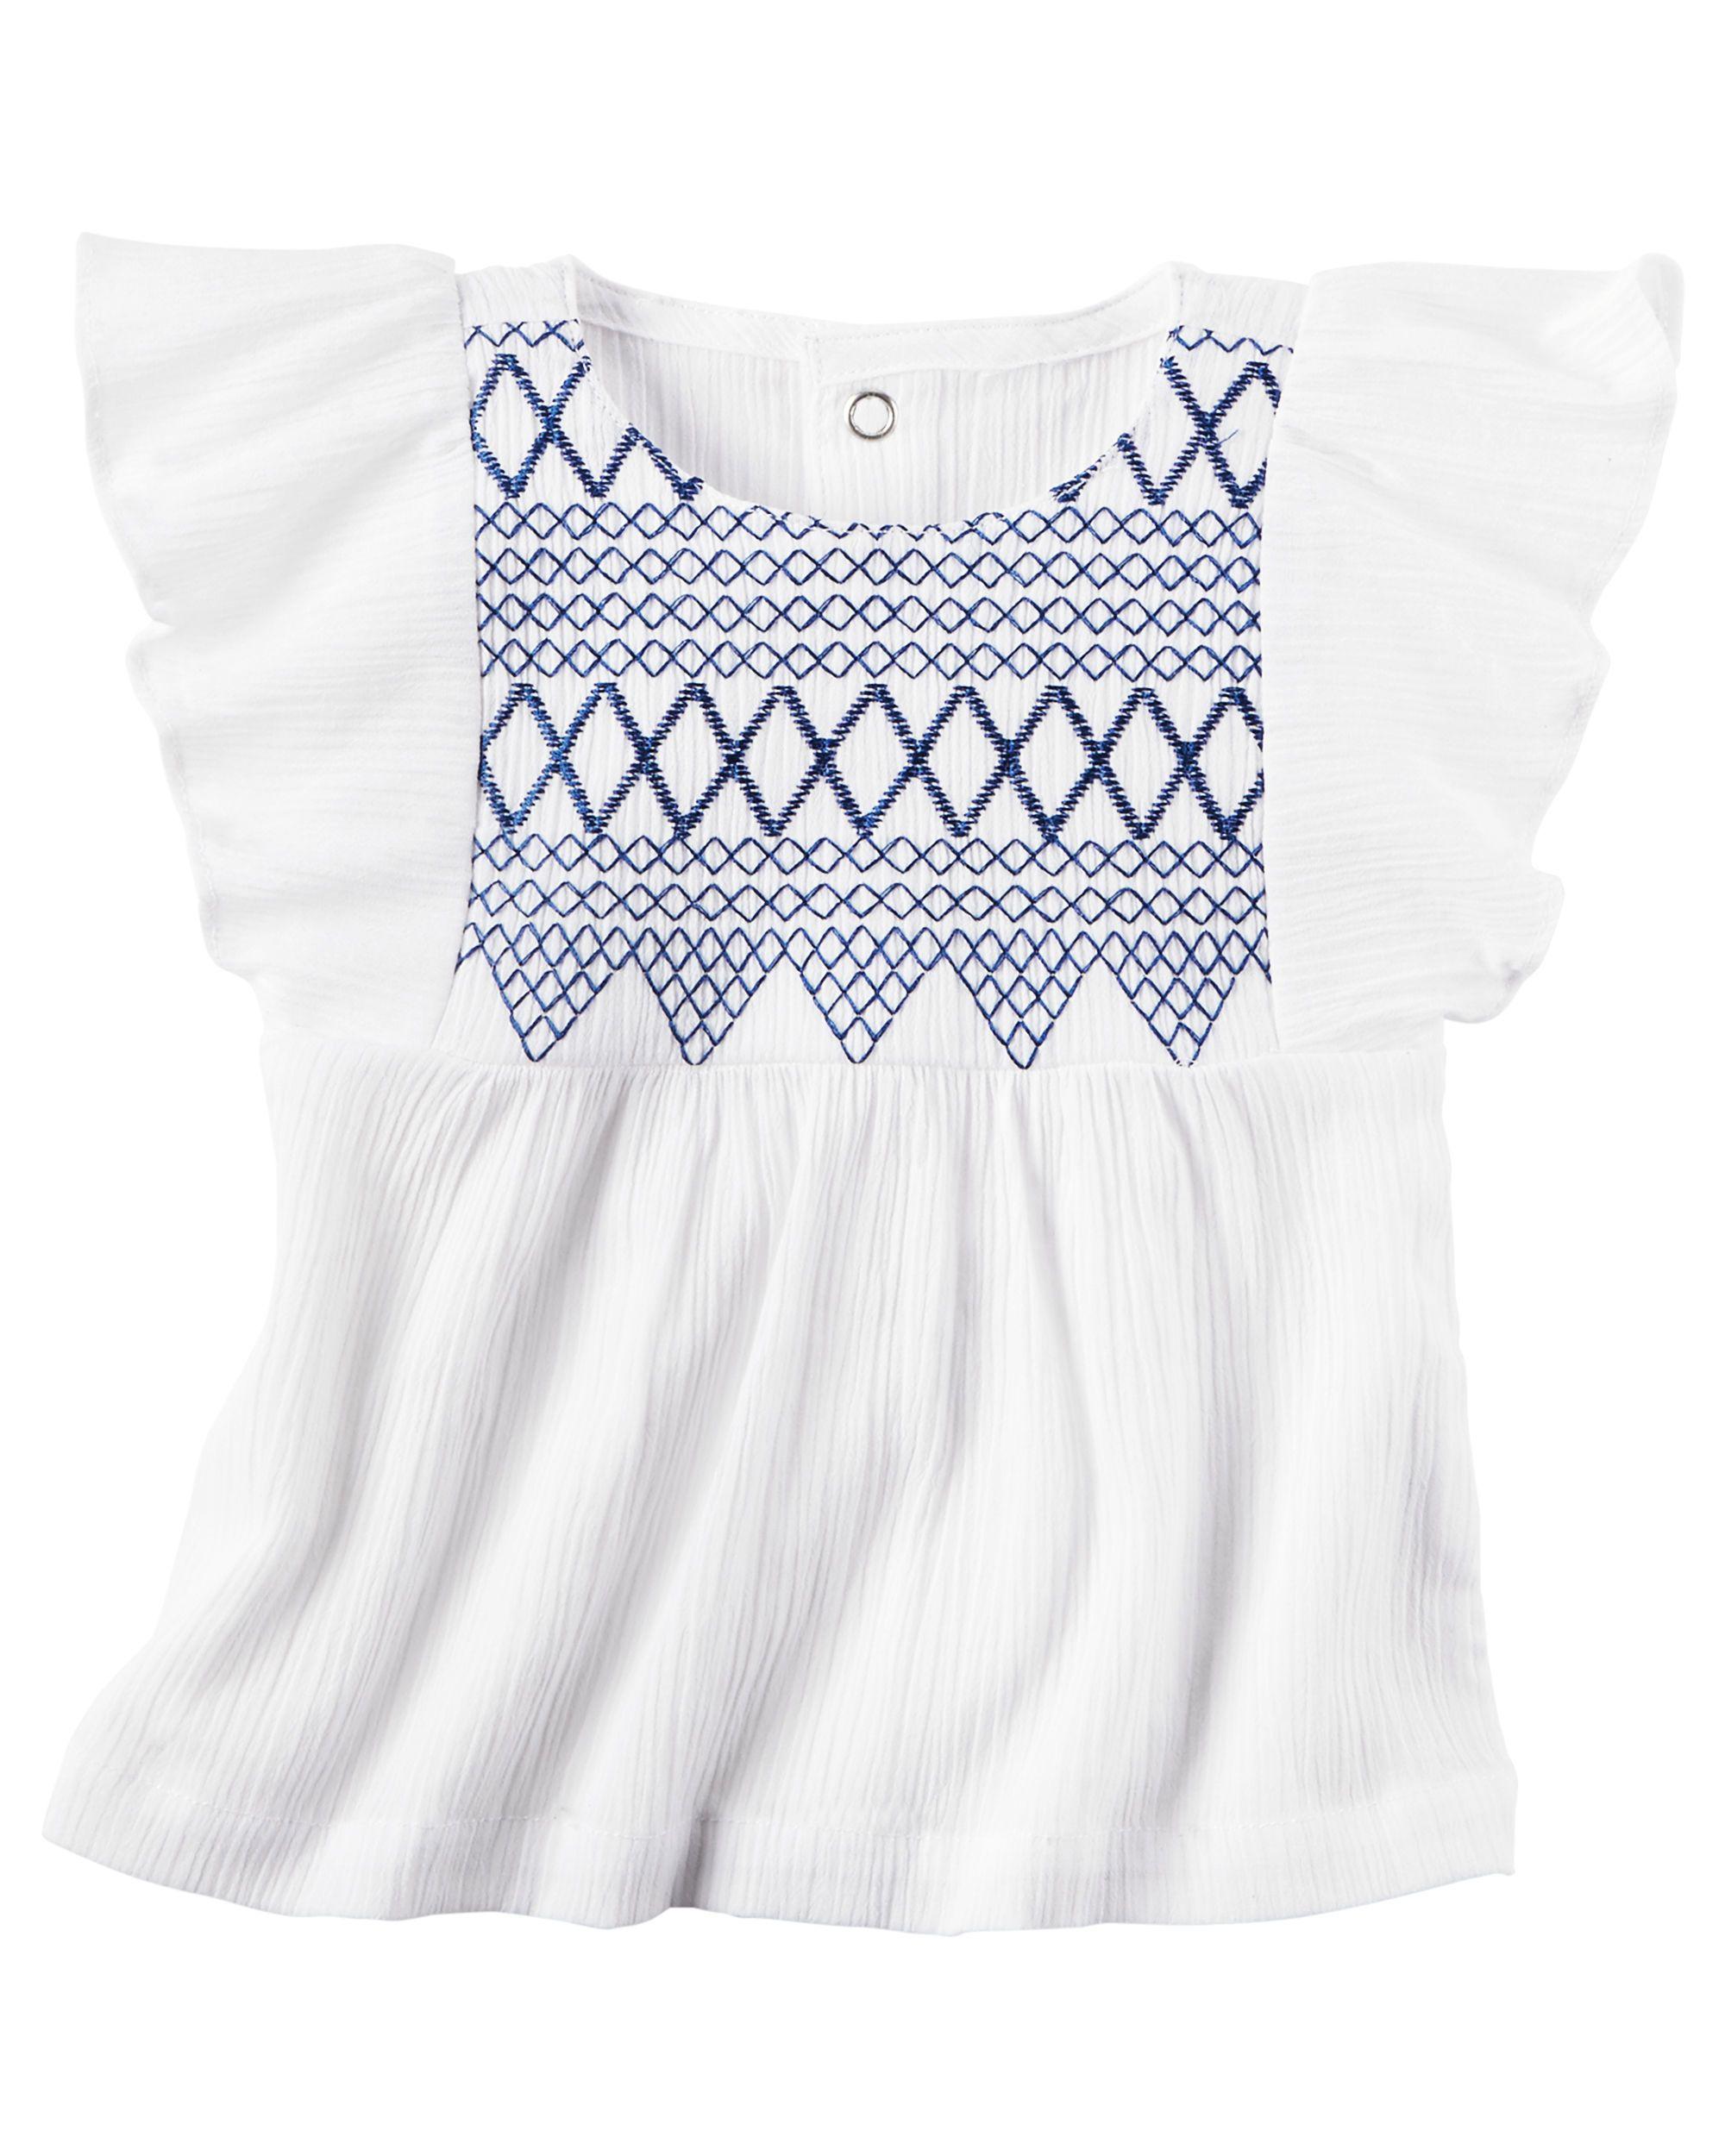 12m, White Carters Baby Girls Embellished Twill Shorts